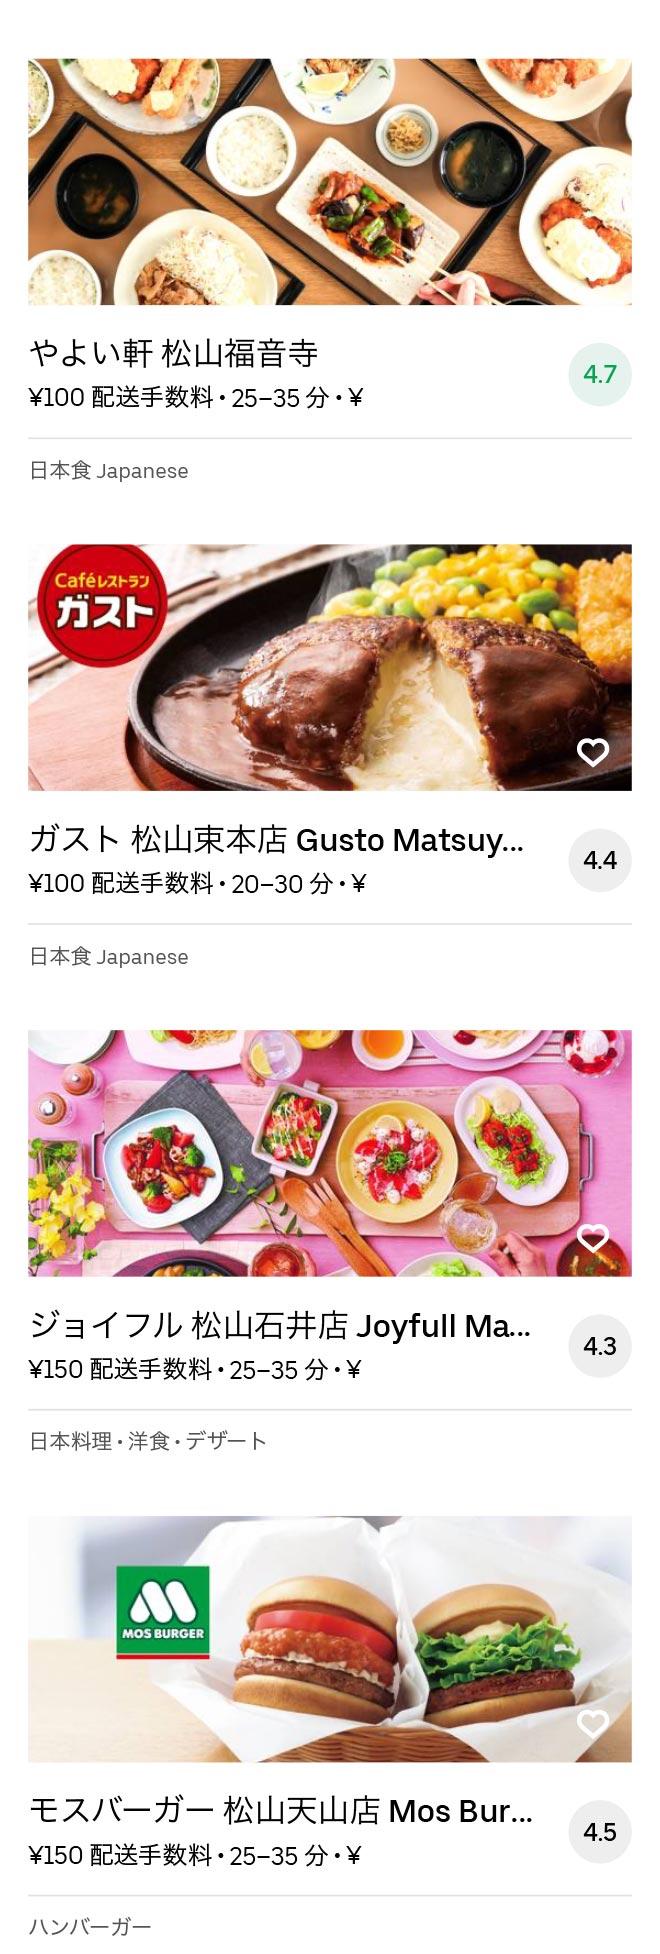 Kitakume menu 2010 04